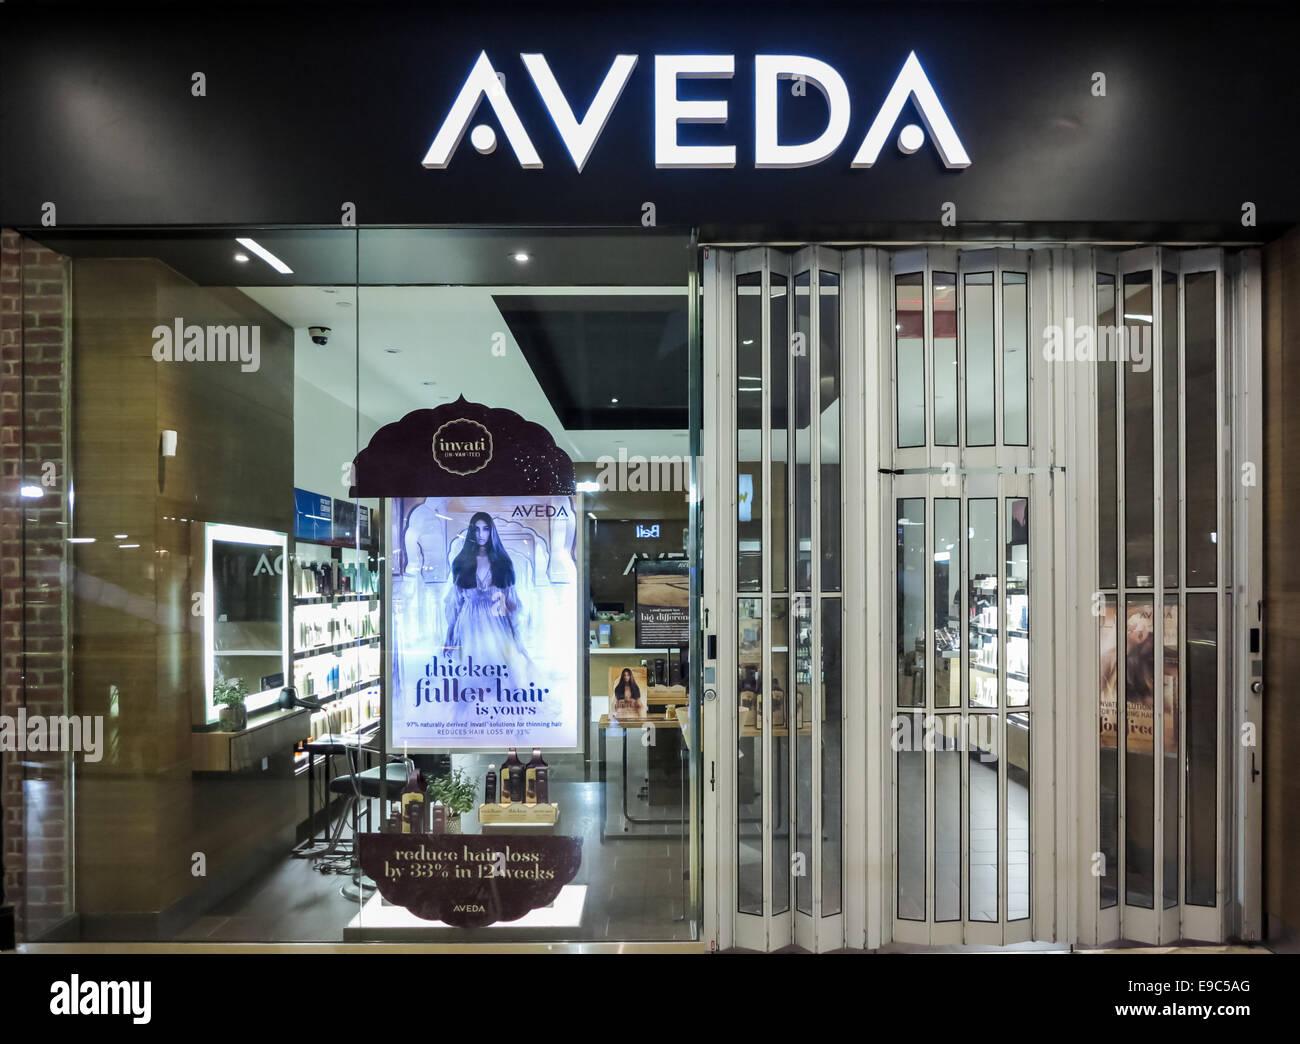 Aveda shop in Alberta, Canada. - Stock Image